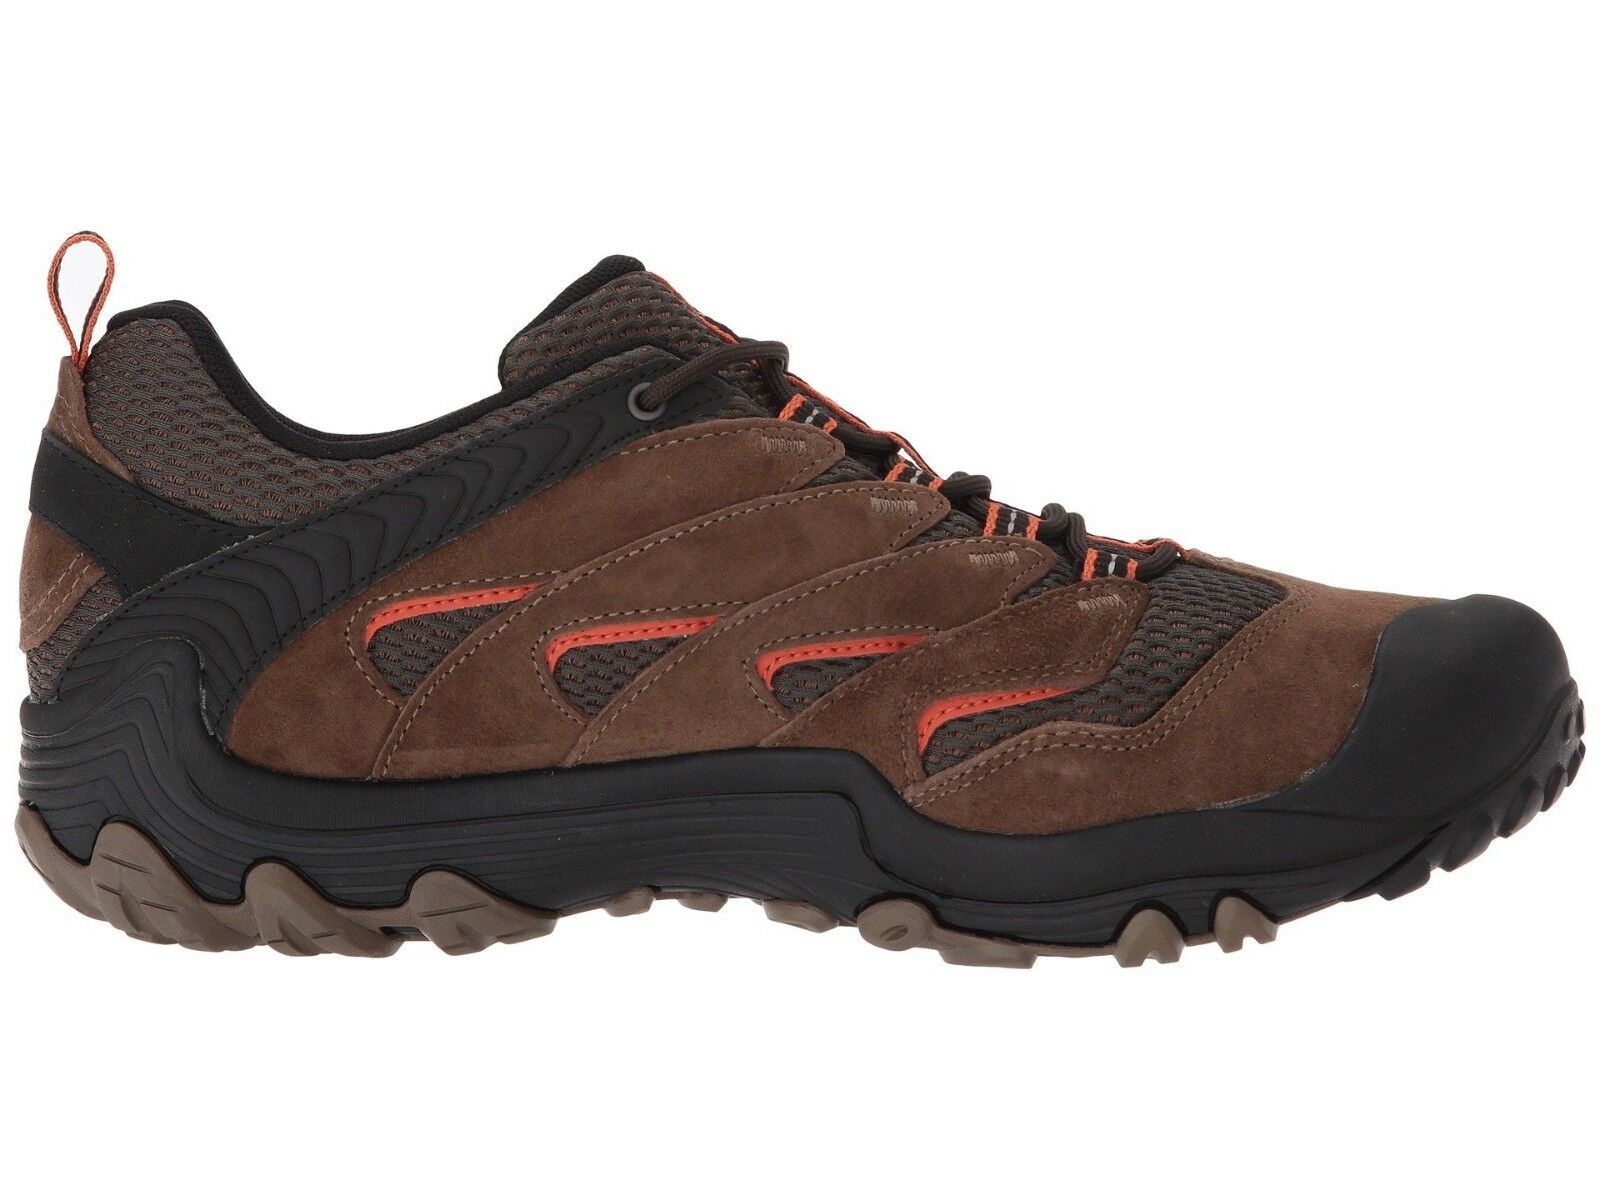 Merrell Men's Chameleon 7 Trail & Hiking shoes Boot Size US 11 D   EU 45 NIB